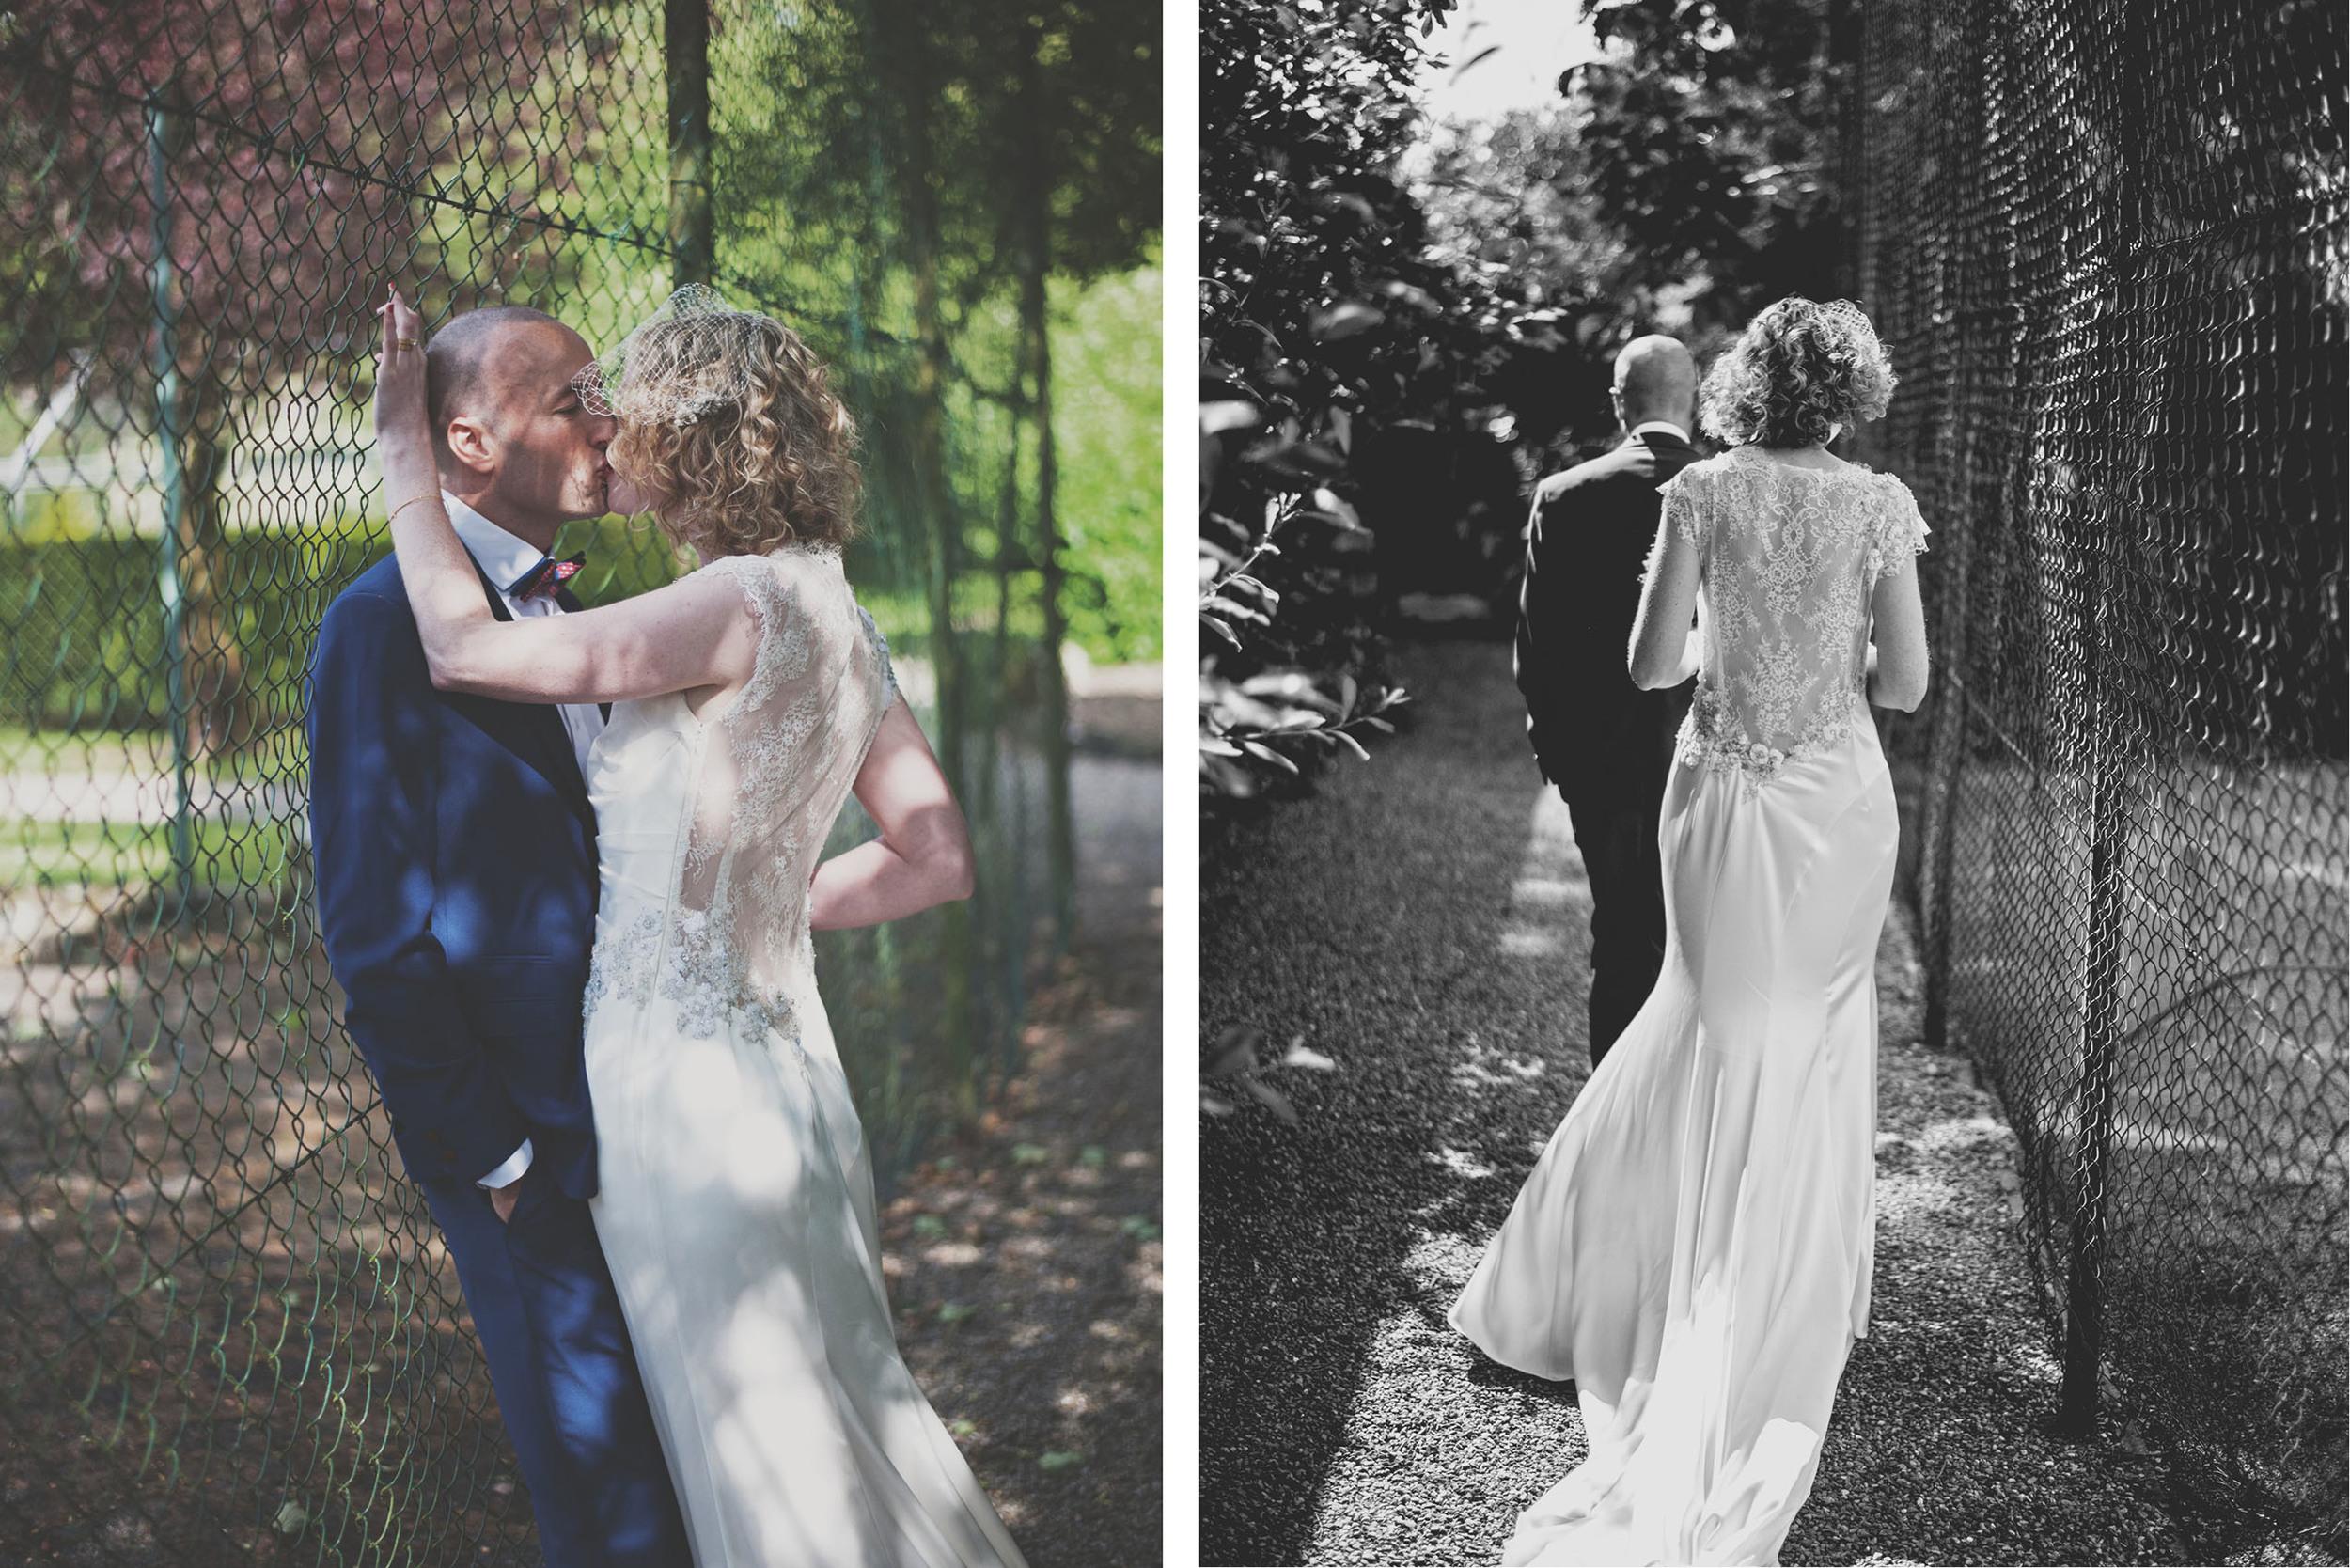 Tanya & Paul's Rathsallagh Wedding 073.jpg